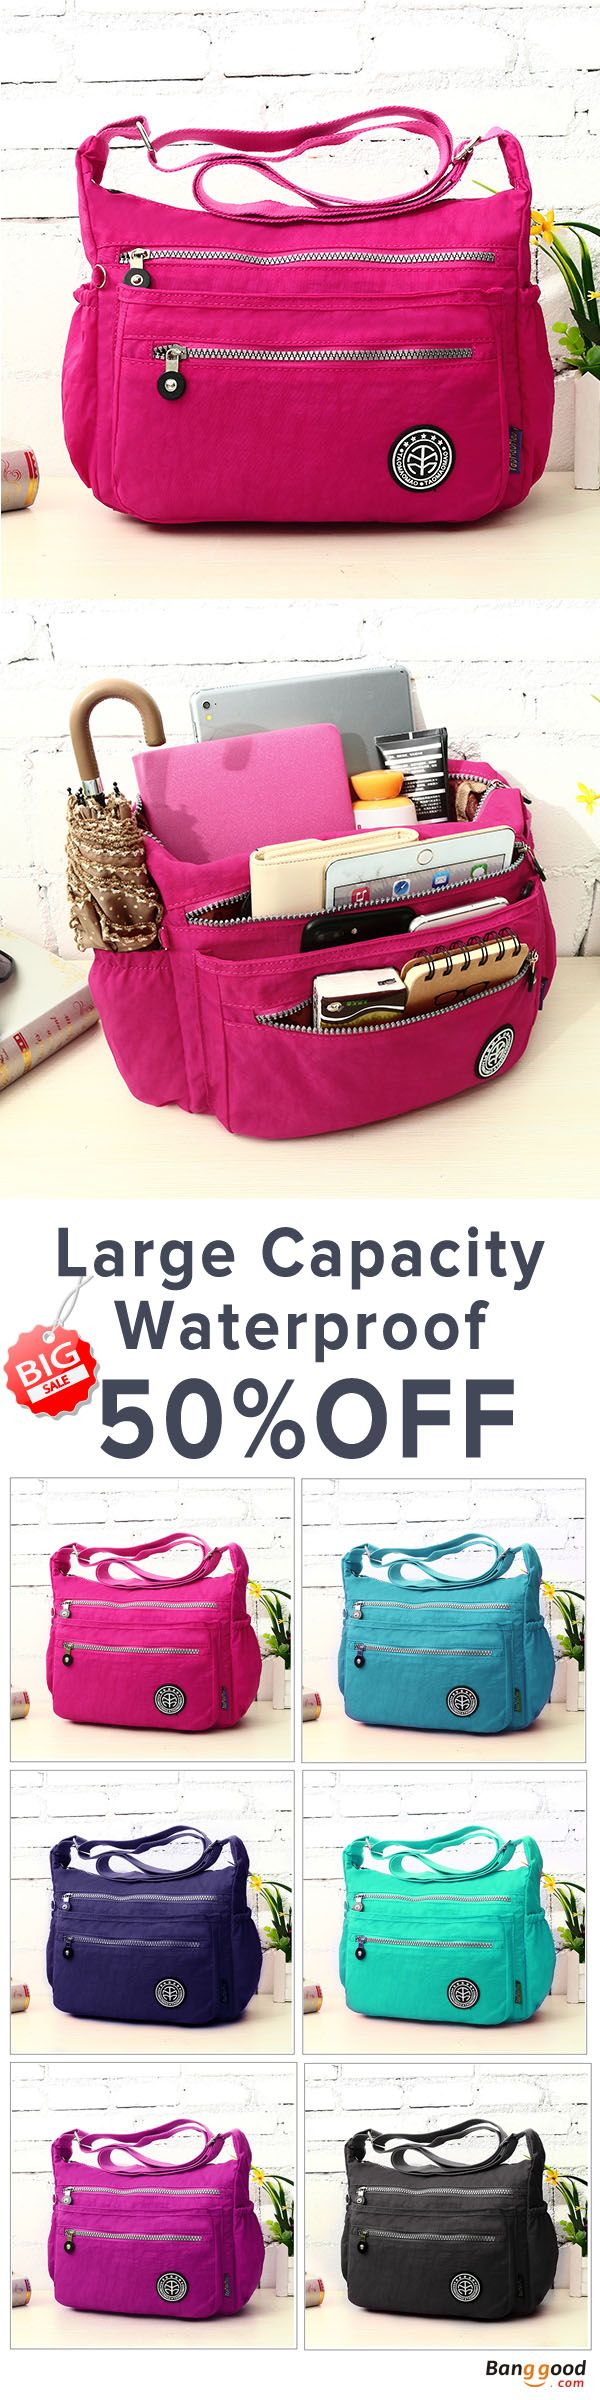 US$18.96+Free shipping.  Women Bags, Waterproof Crossbody Bags, Casual Bags, Chest Bags, Multifunction Handbag, Backpack, Shoulder Bags. Waterproof, Large Capacity. Color: Black, Blue, Green, Purple, Burgundy, Rose Red, Sky Blue, Beige. Shop now~